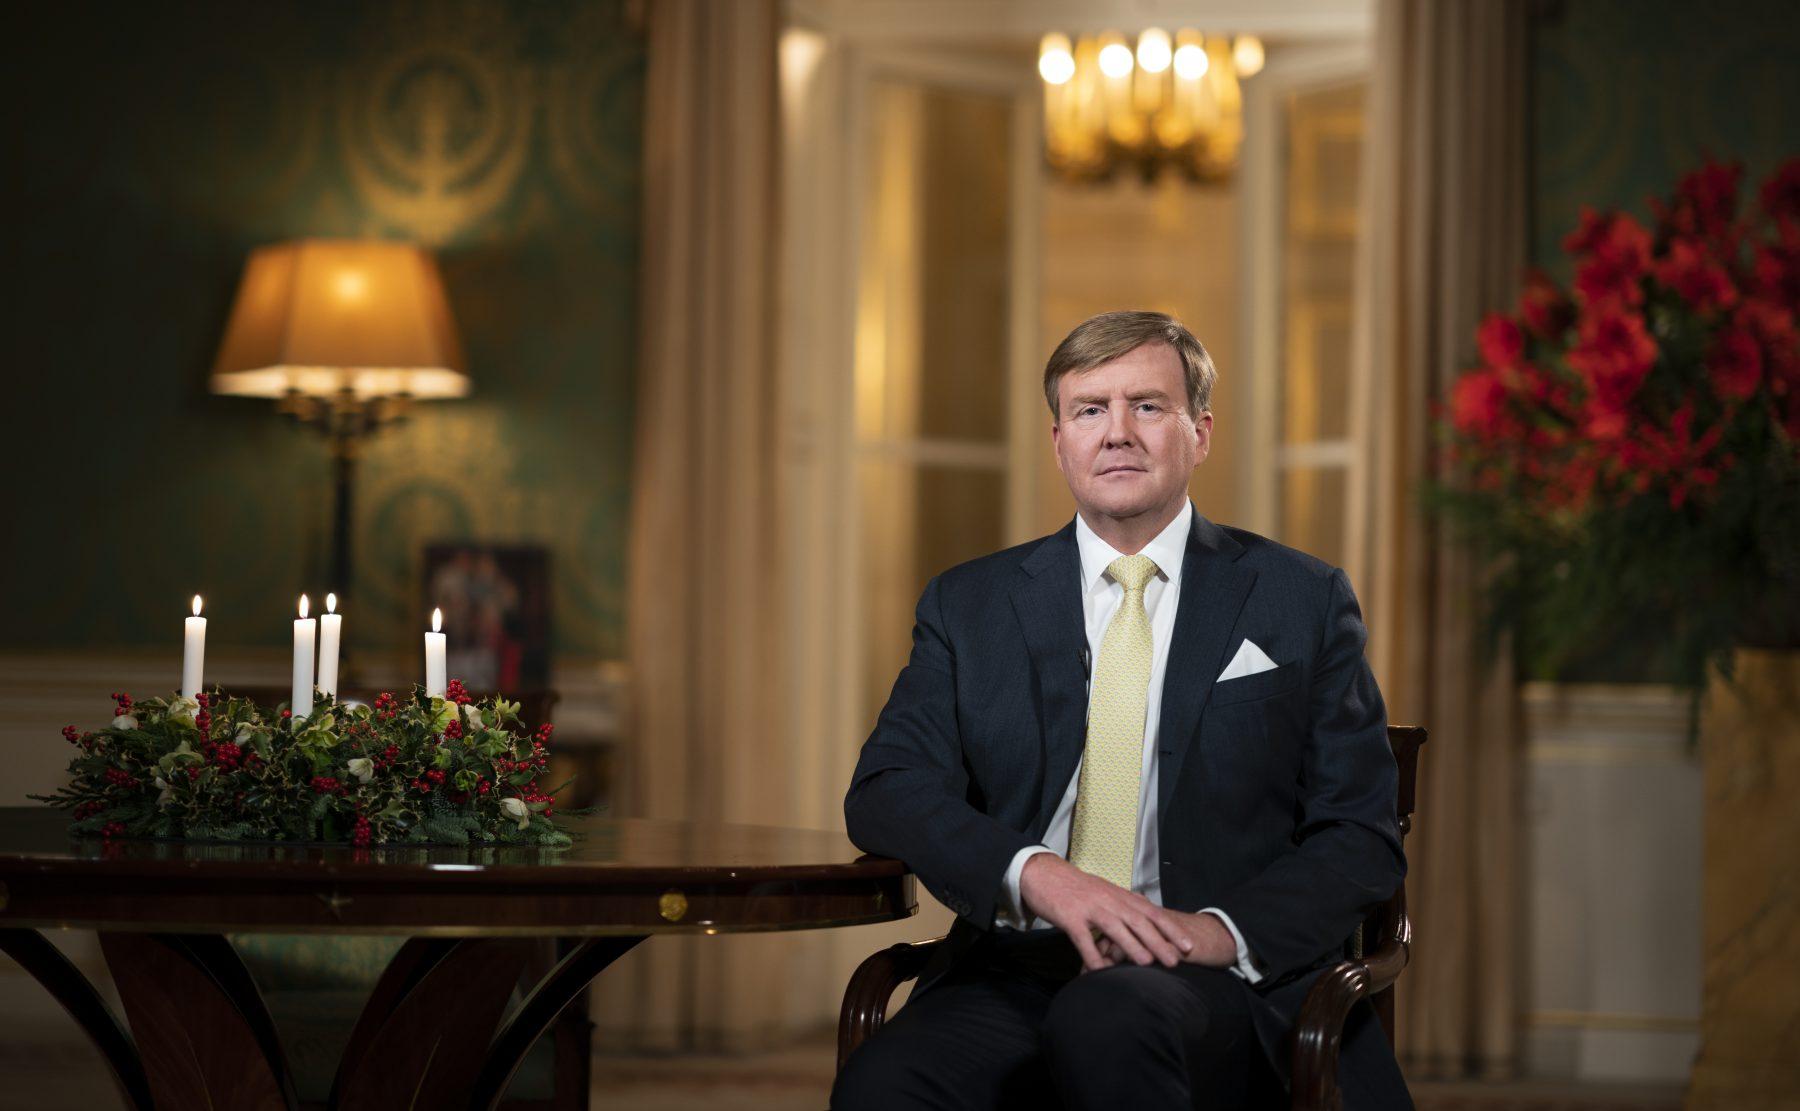 b8aecd18a0dbb1 Kerstrede koning Willem-Alexander december 2018 - LINDA.nl